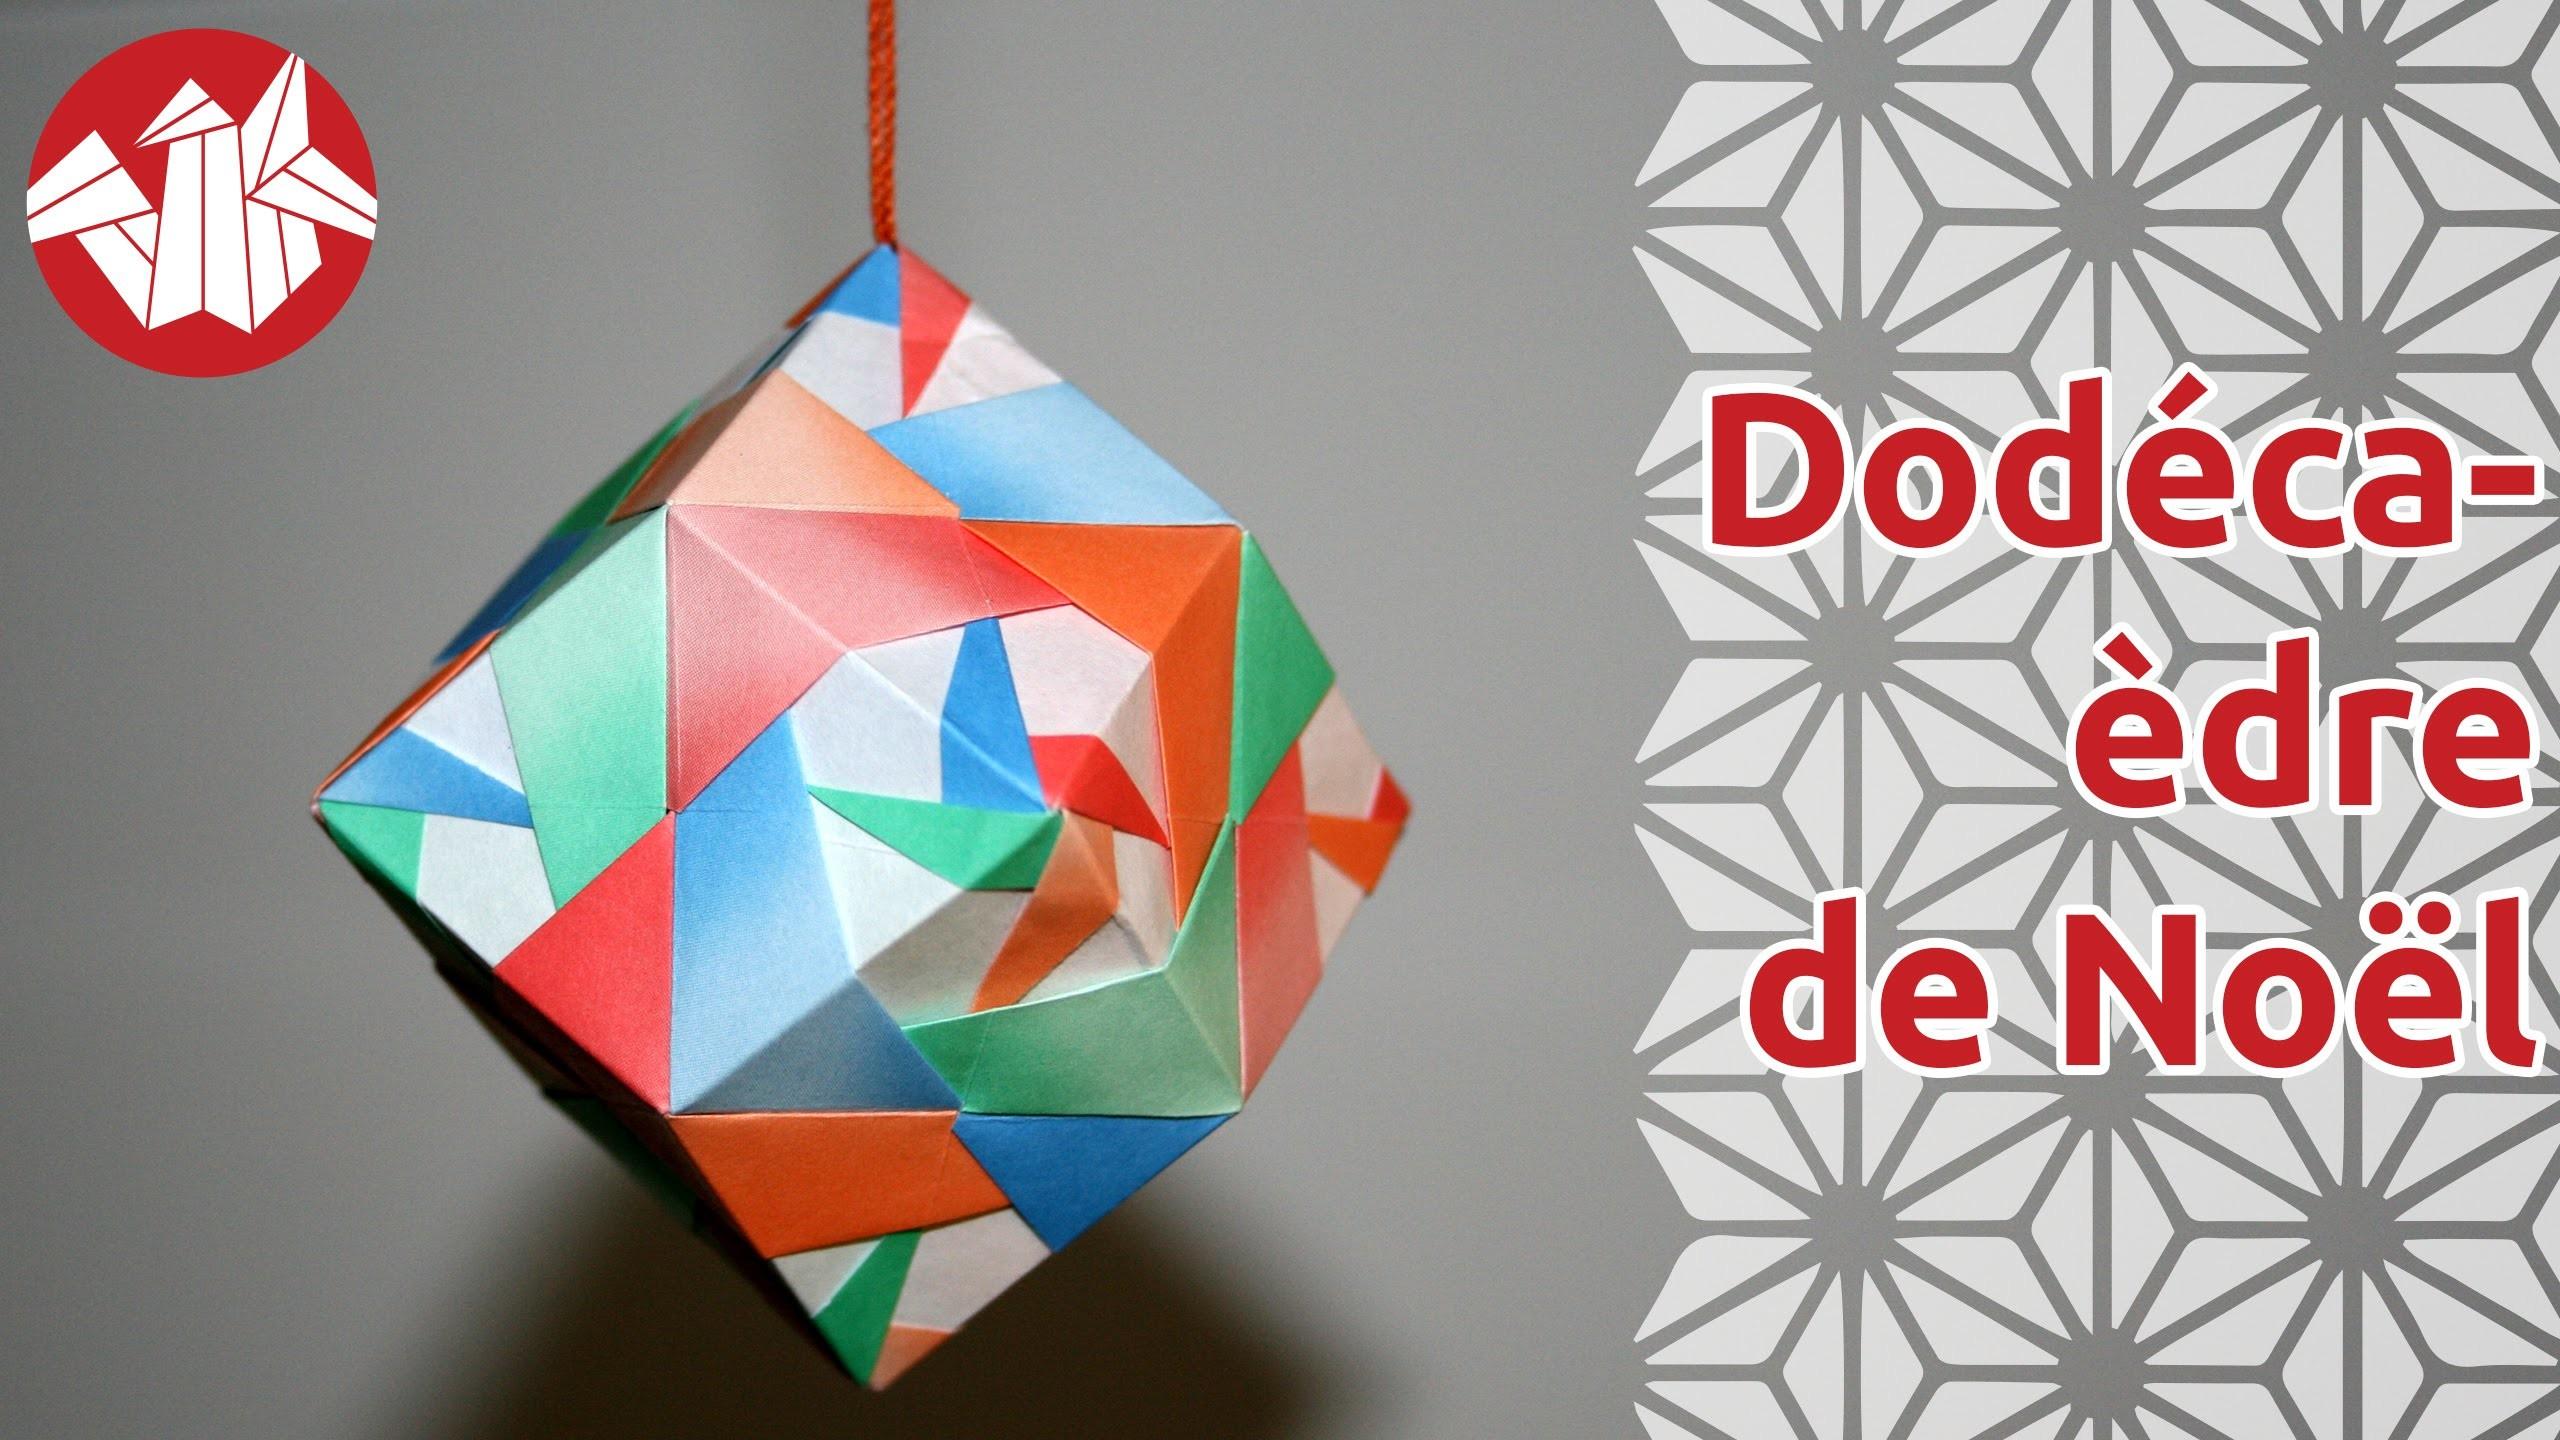 Origami - Dodécaèdre de Noël de Tomoko Fuse [Senbazuru]